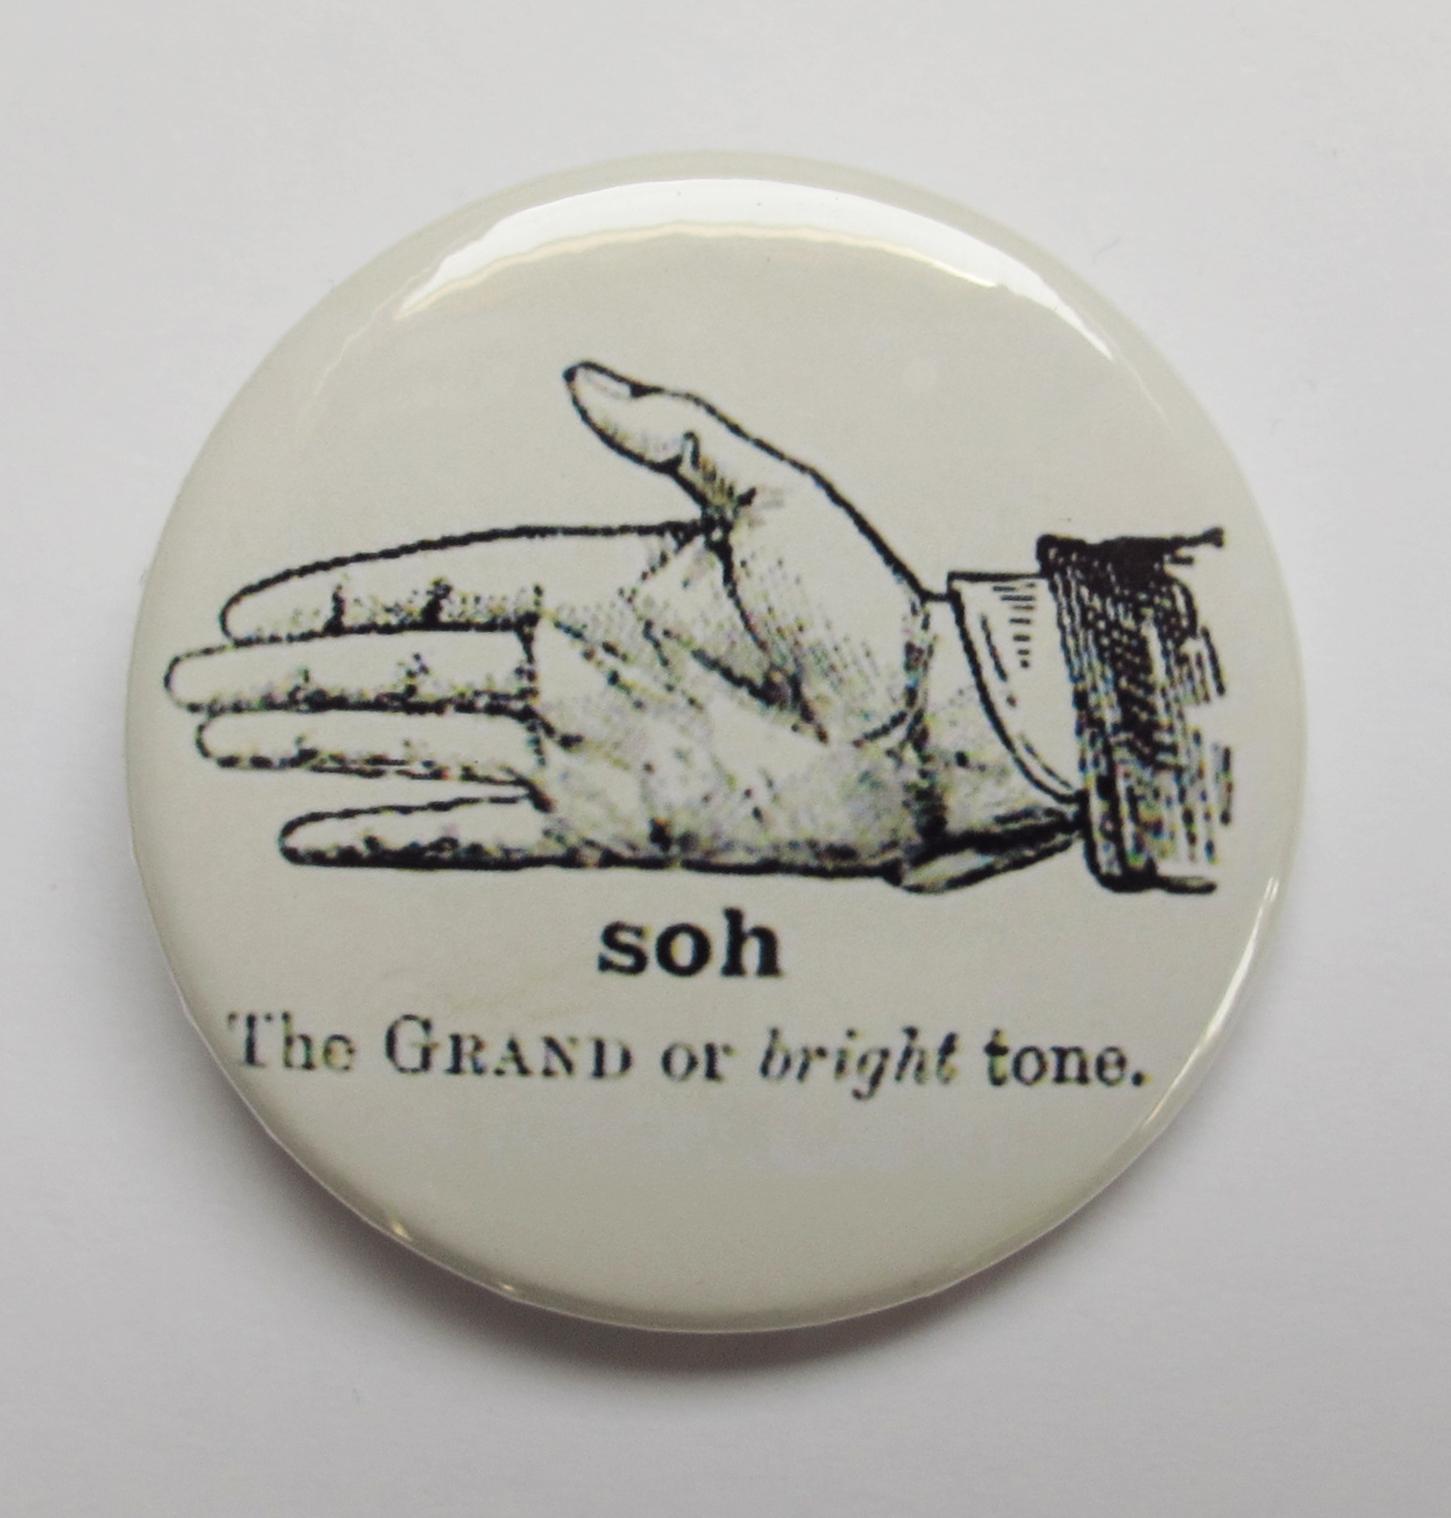 'Soh' What!